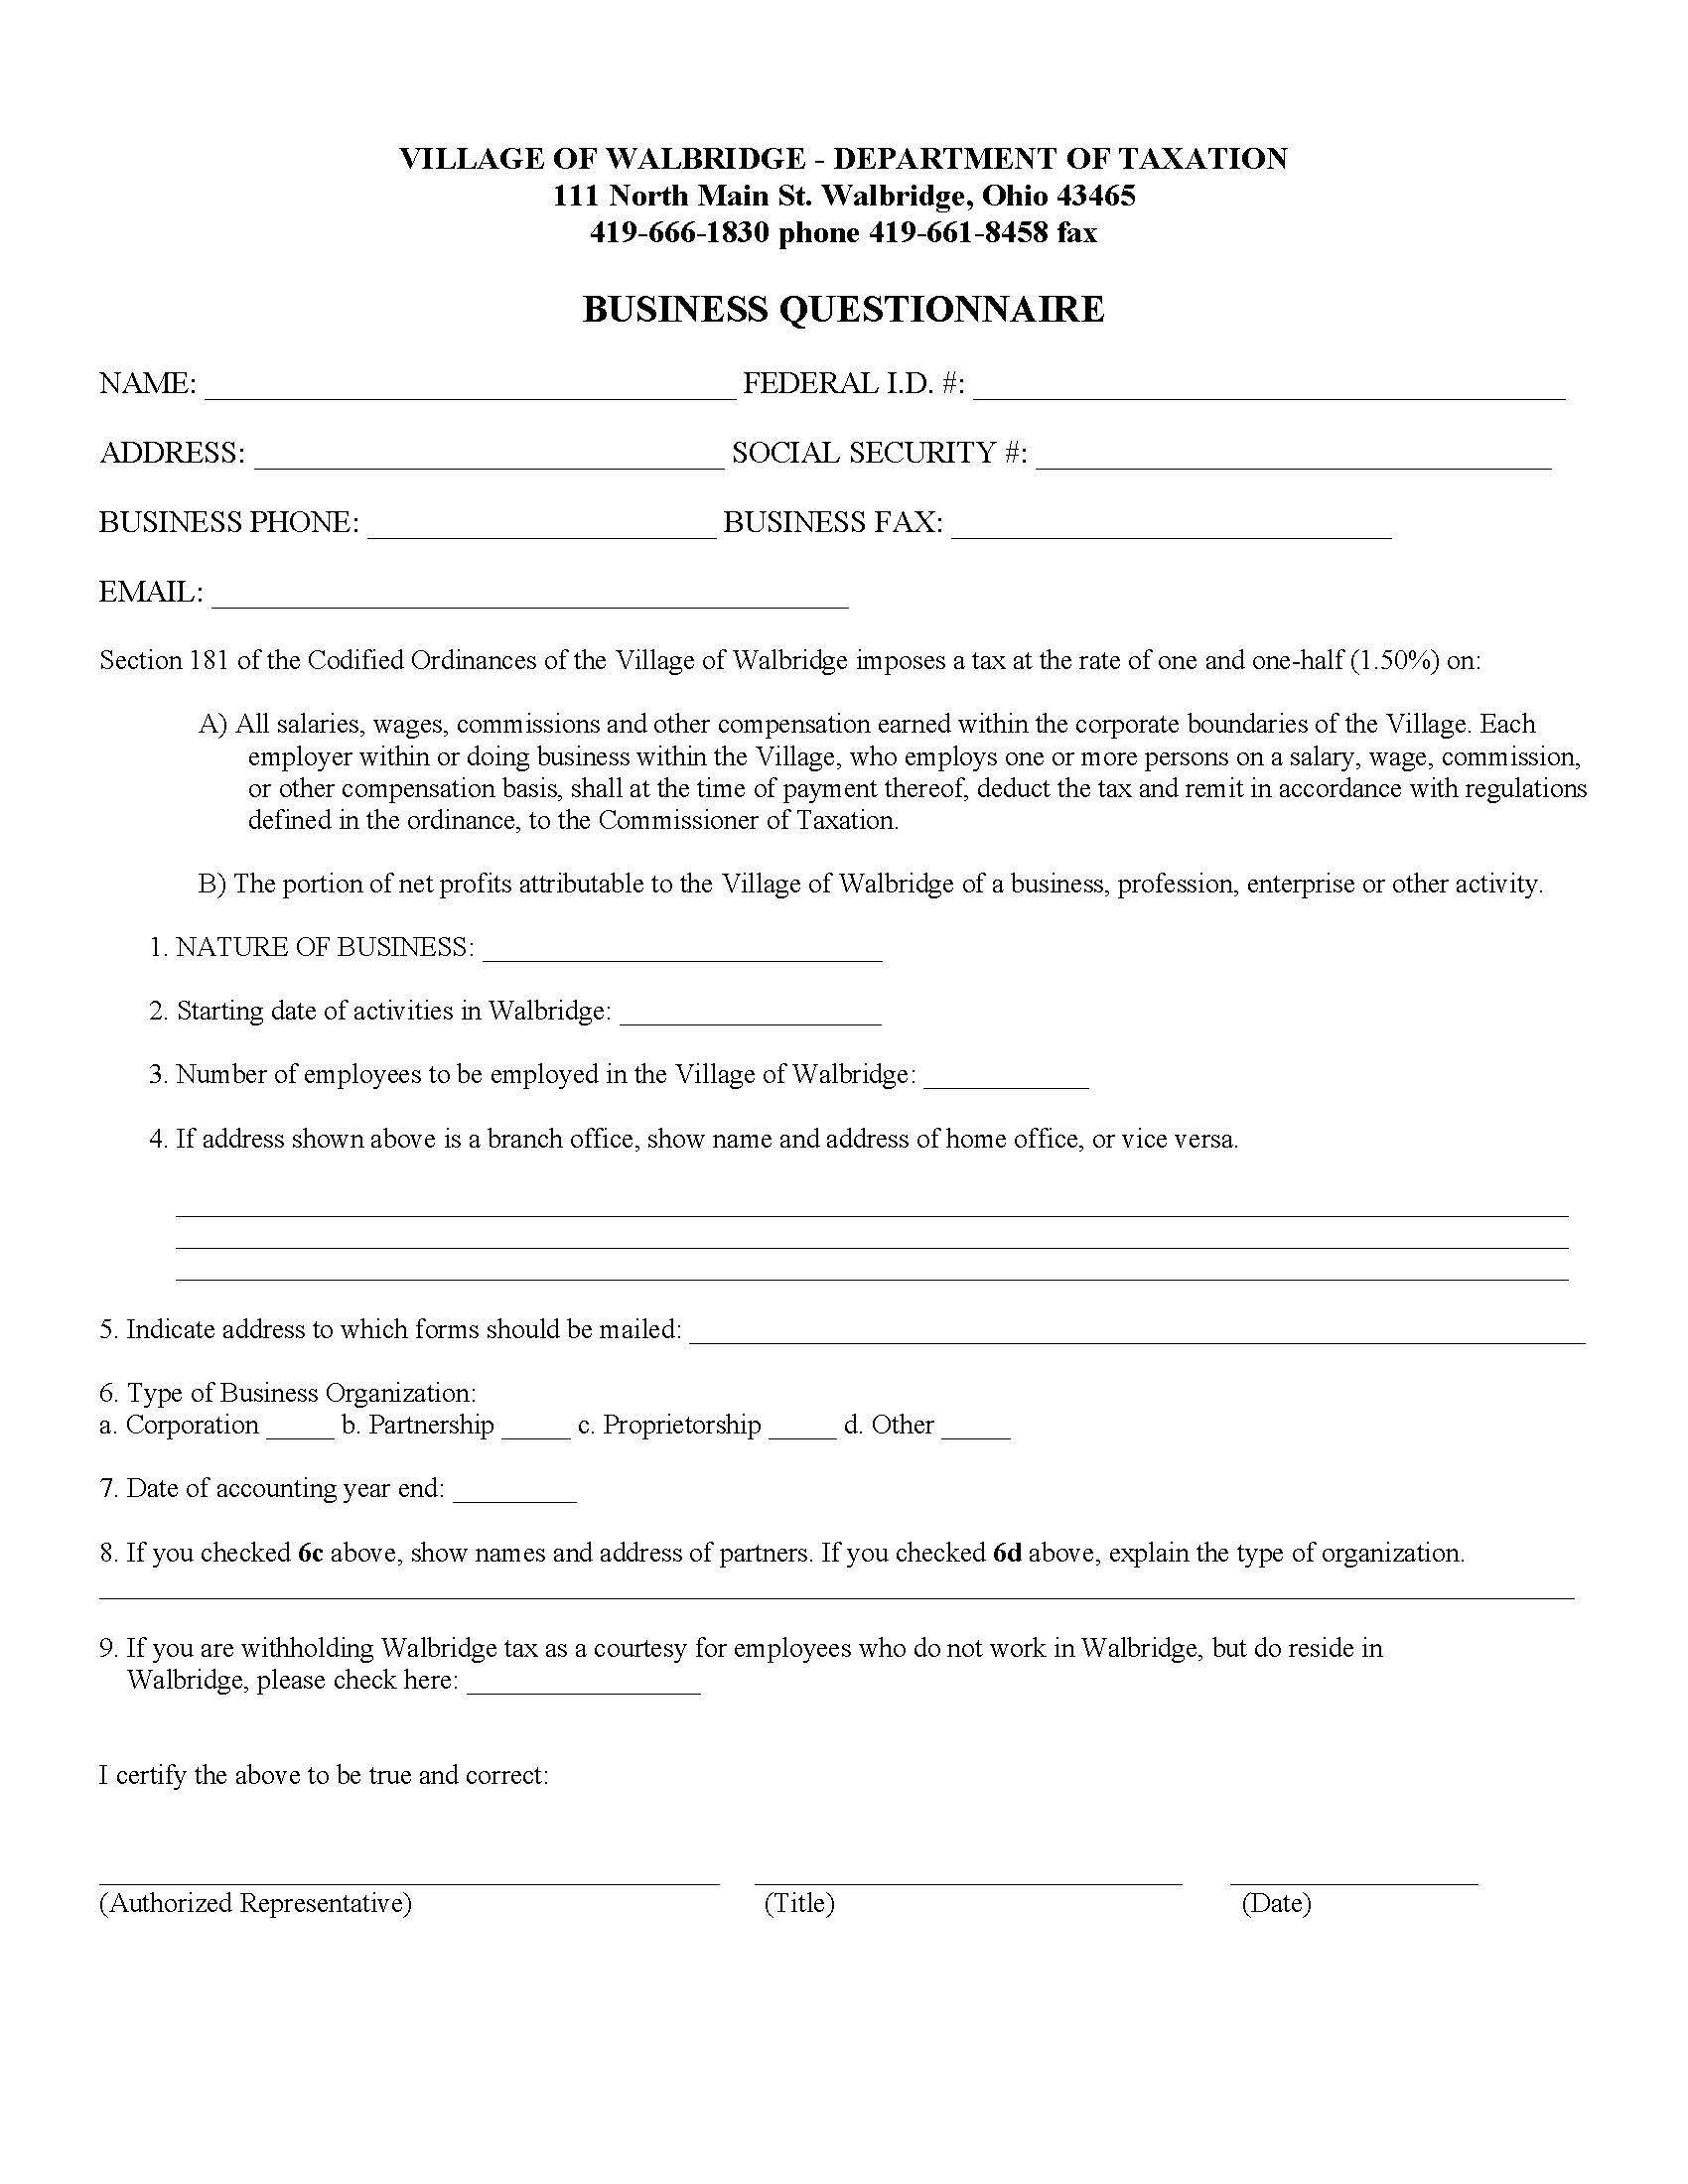 Village of Walbridge Ohio Tax Forms – Tax Form